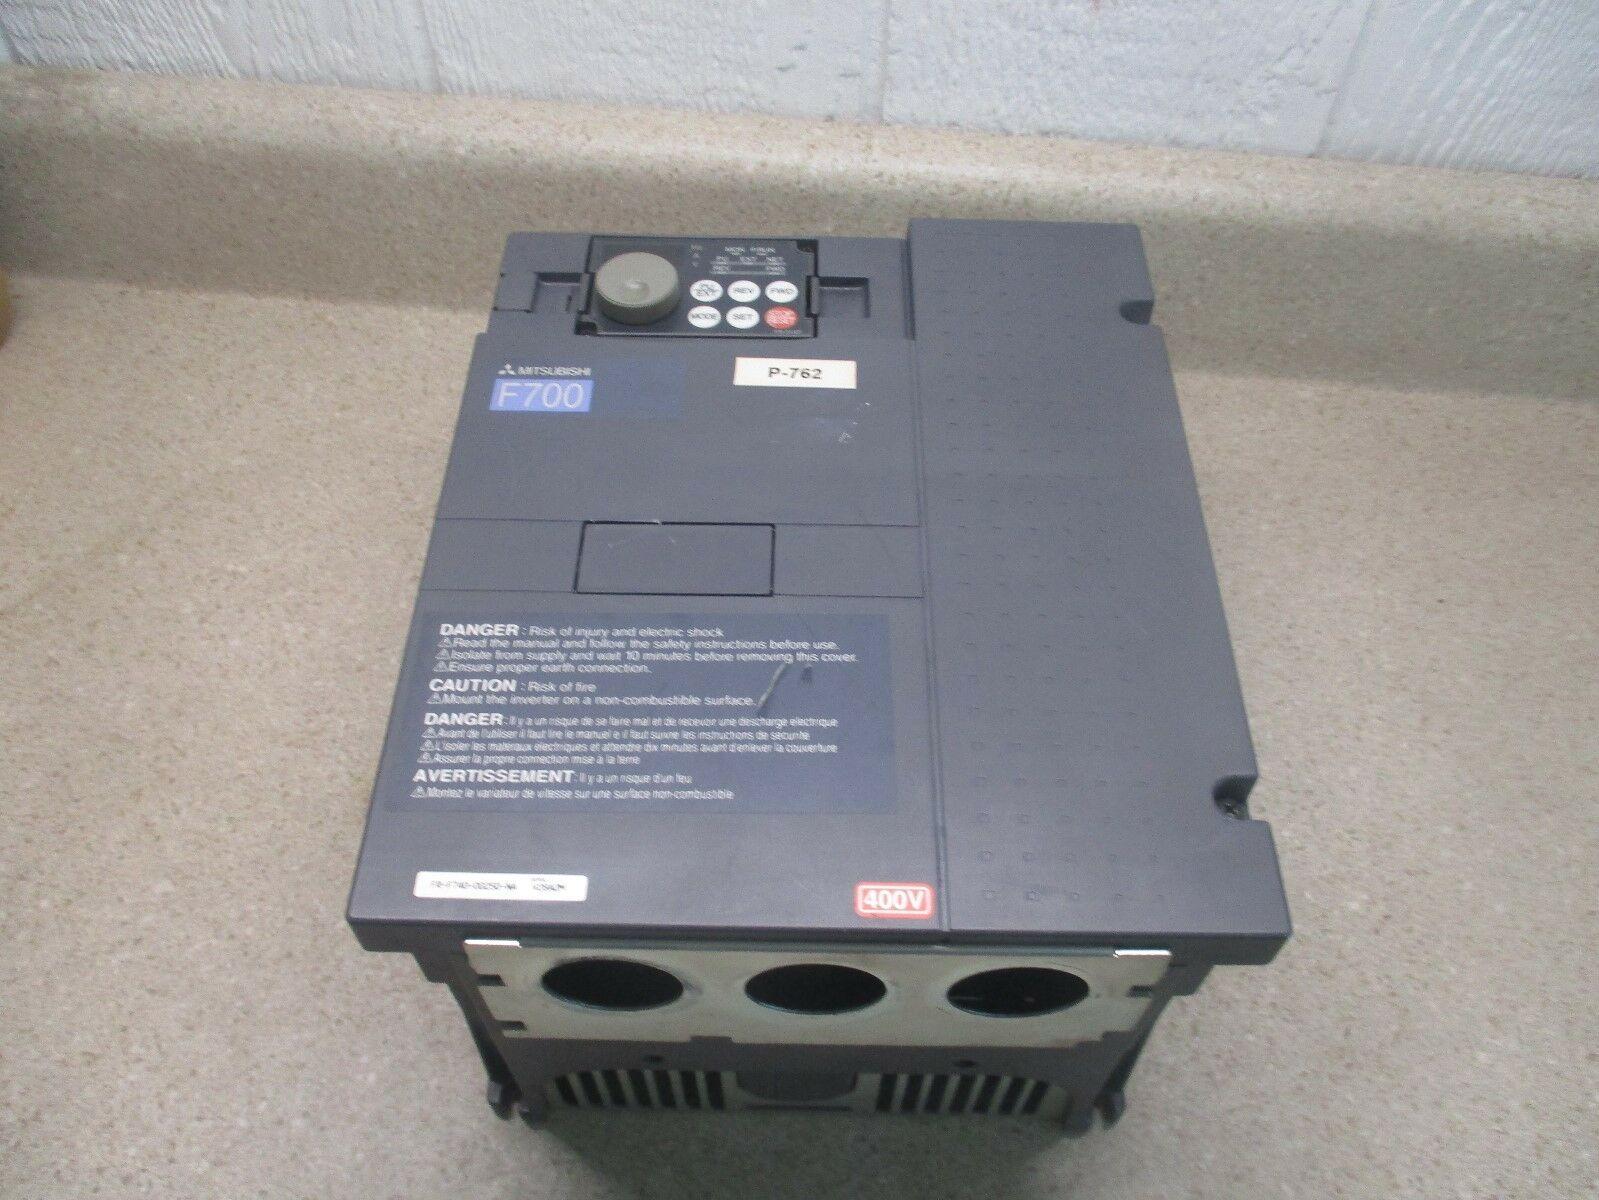 维修 贝加莱B&R工业电脑 Mobile Panel Automation PC 51x 910 725 AP900